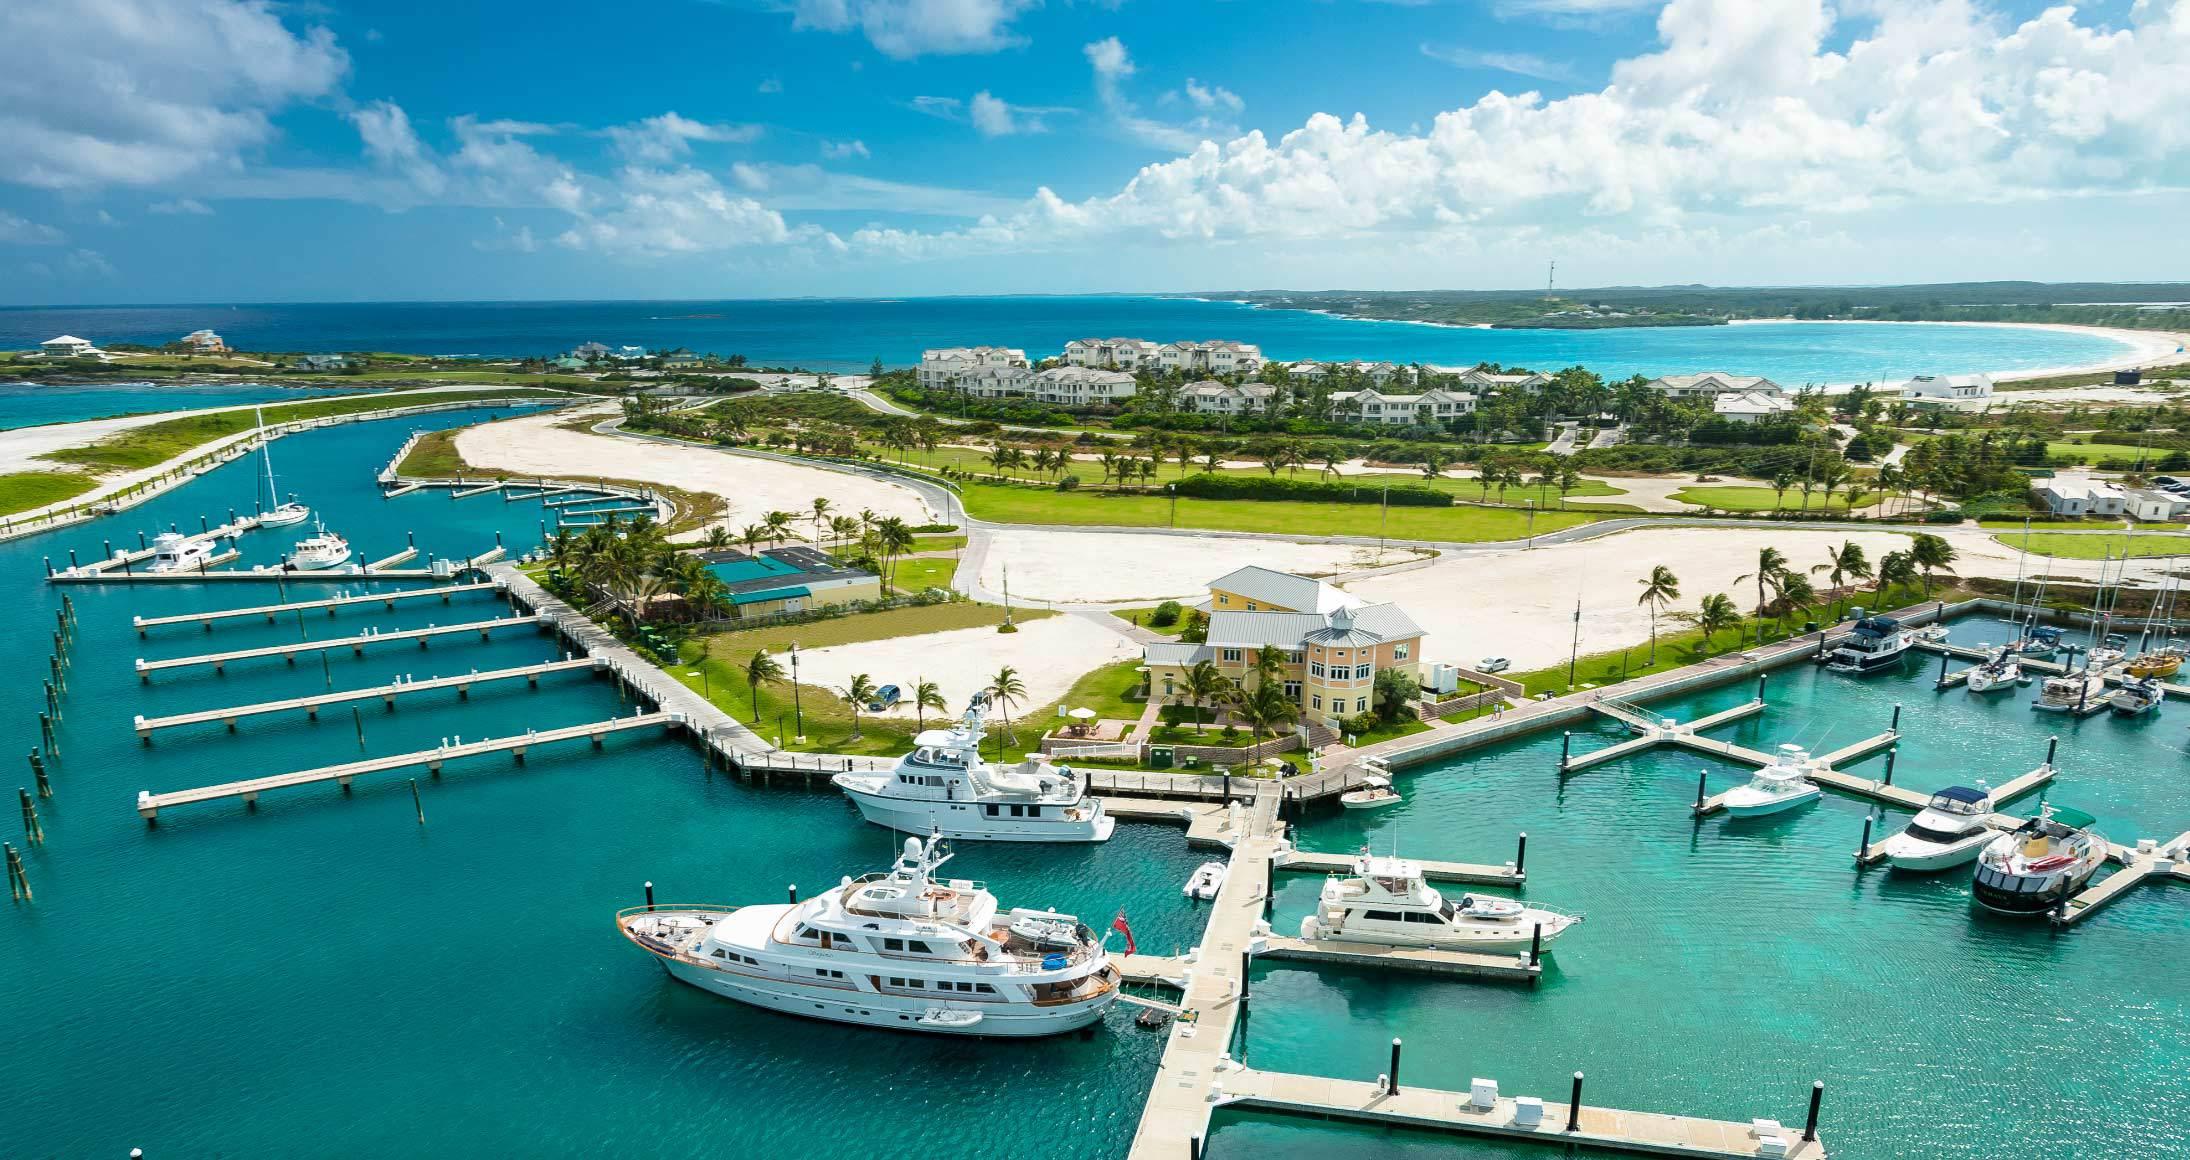 Sandals Emerald Bay - All-Inclusive Luxury Resort in Exuma